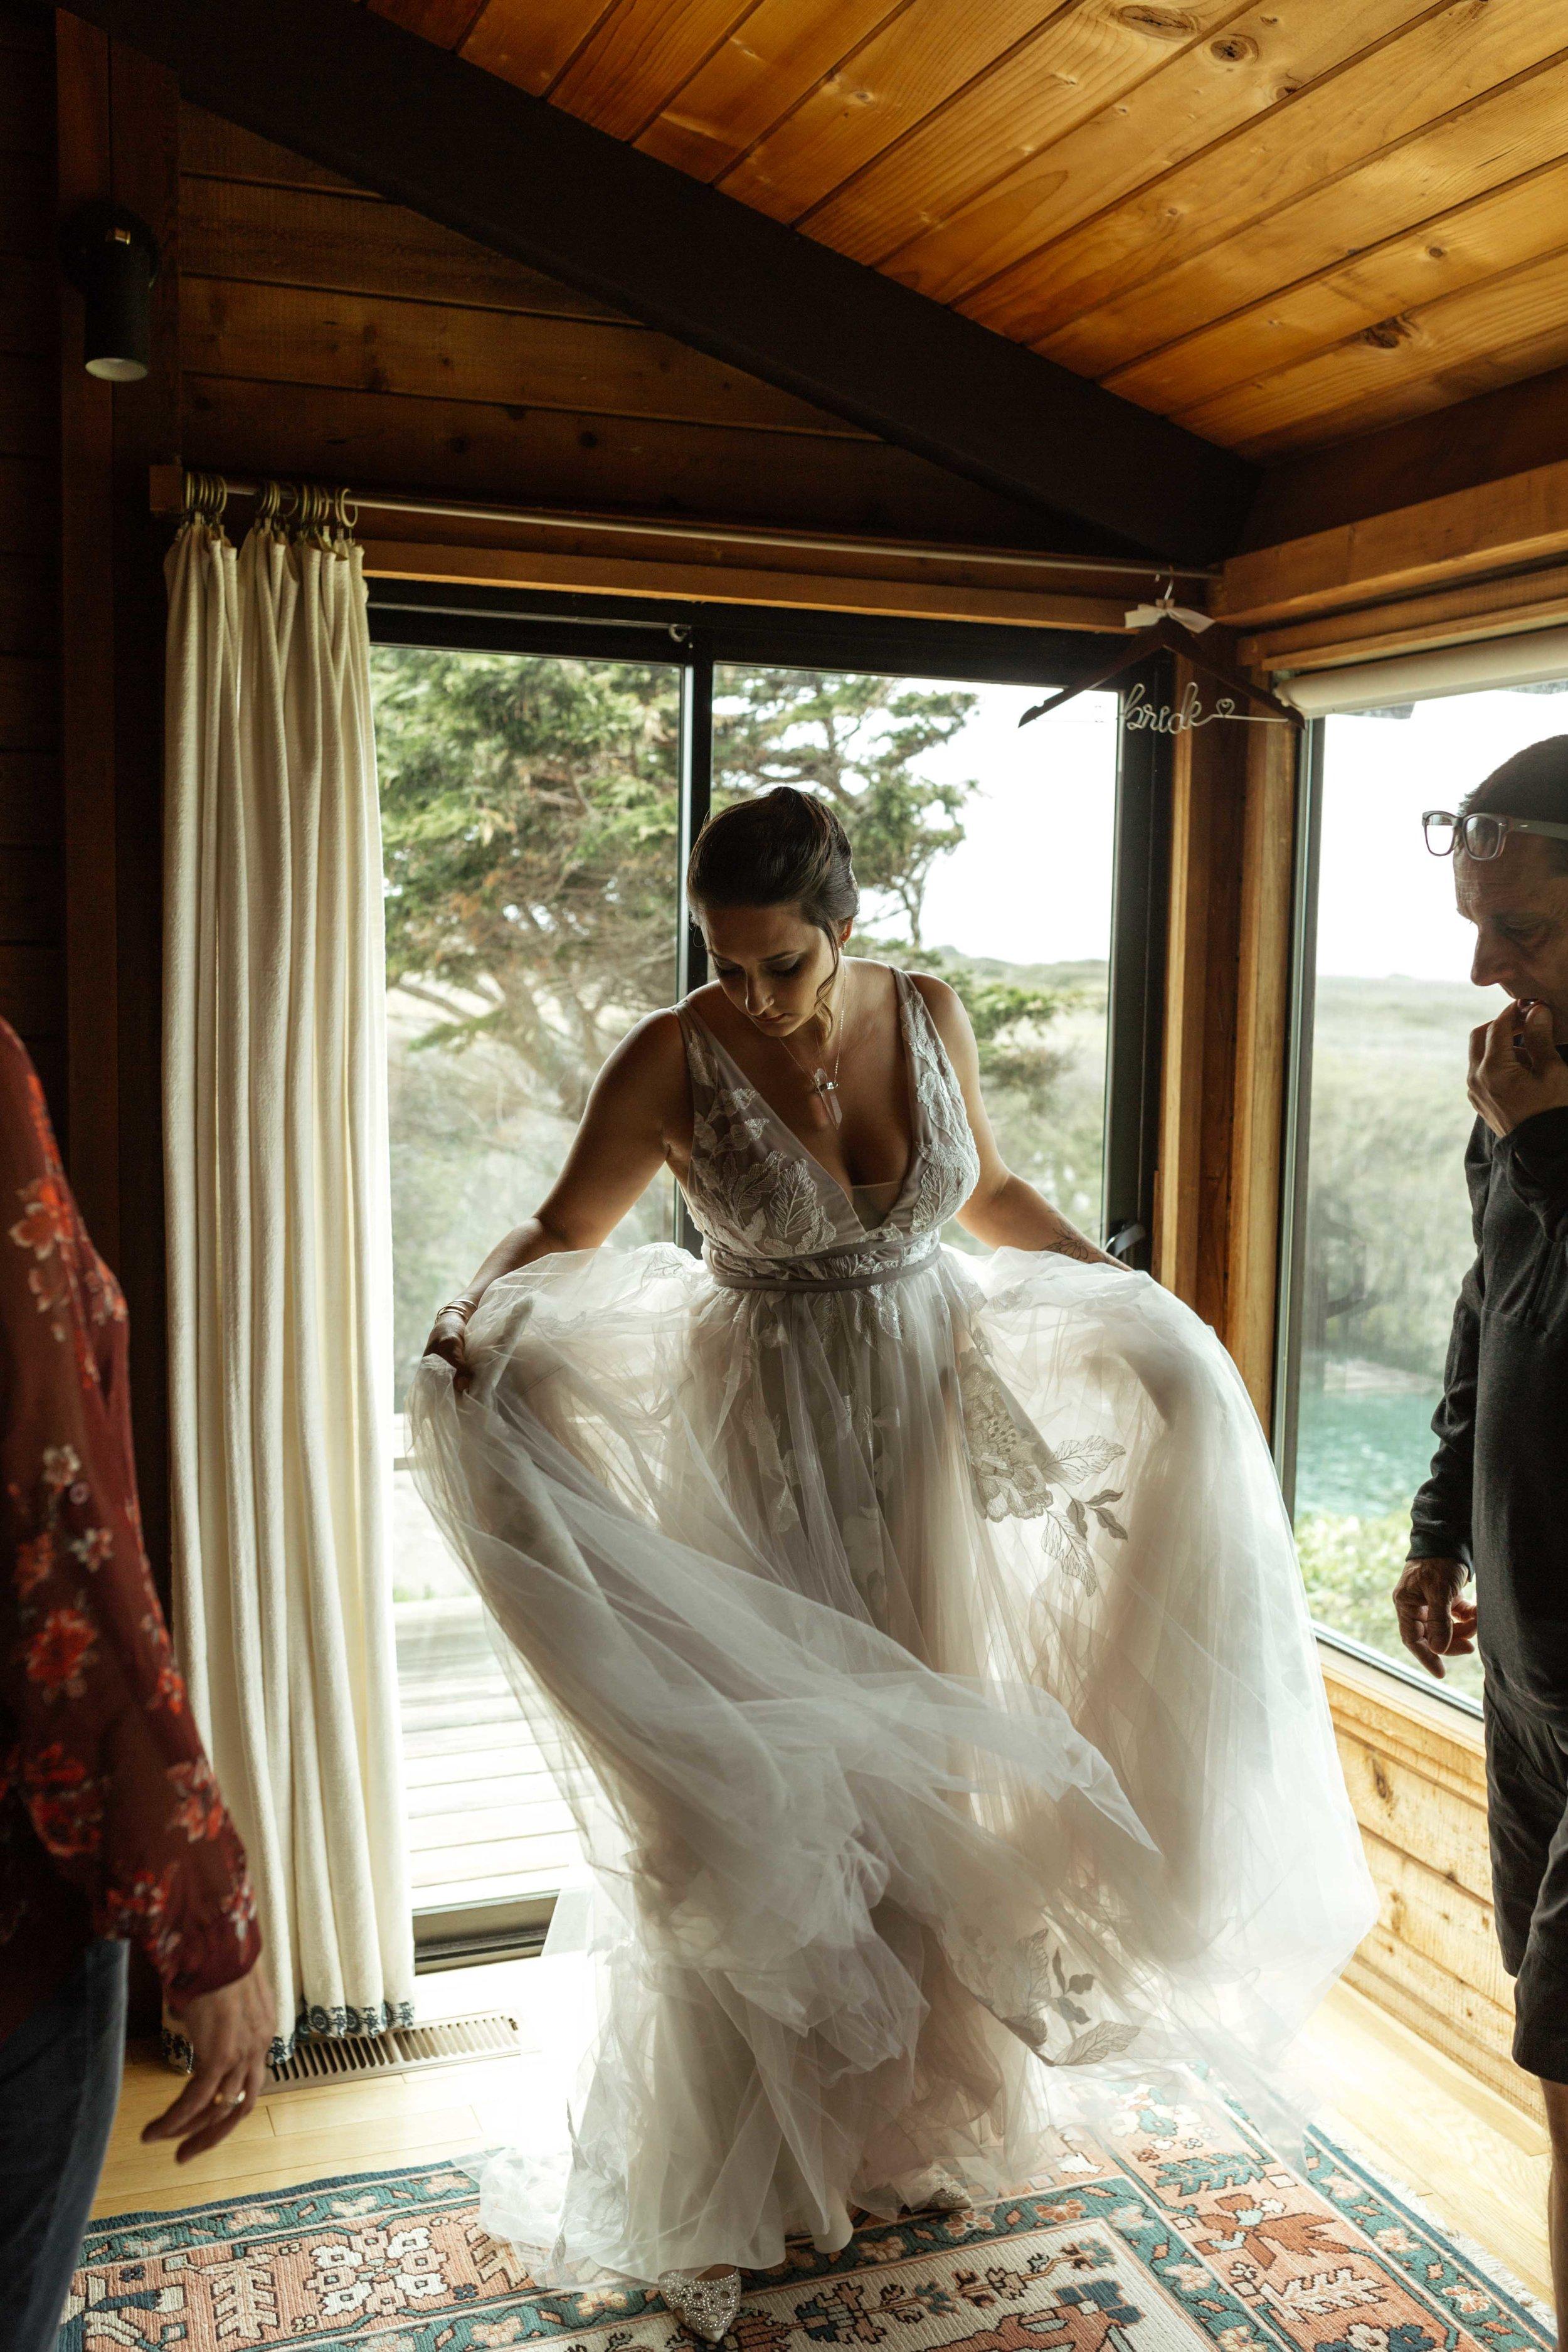 galatea spokane bridal dress wedding gown